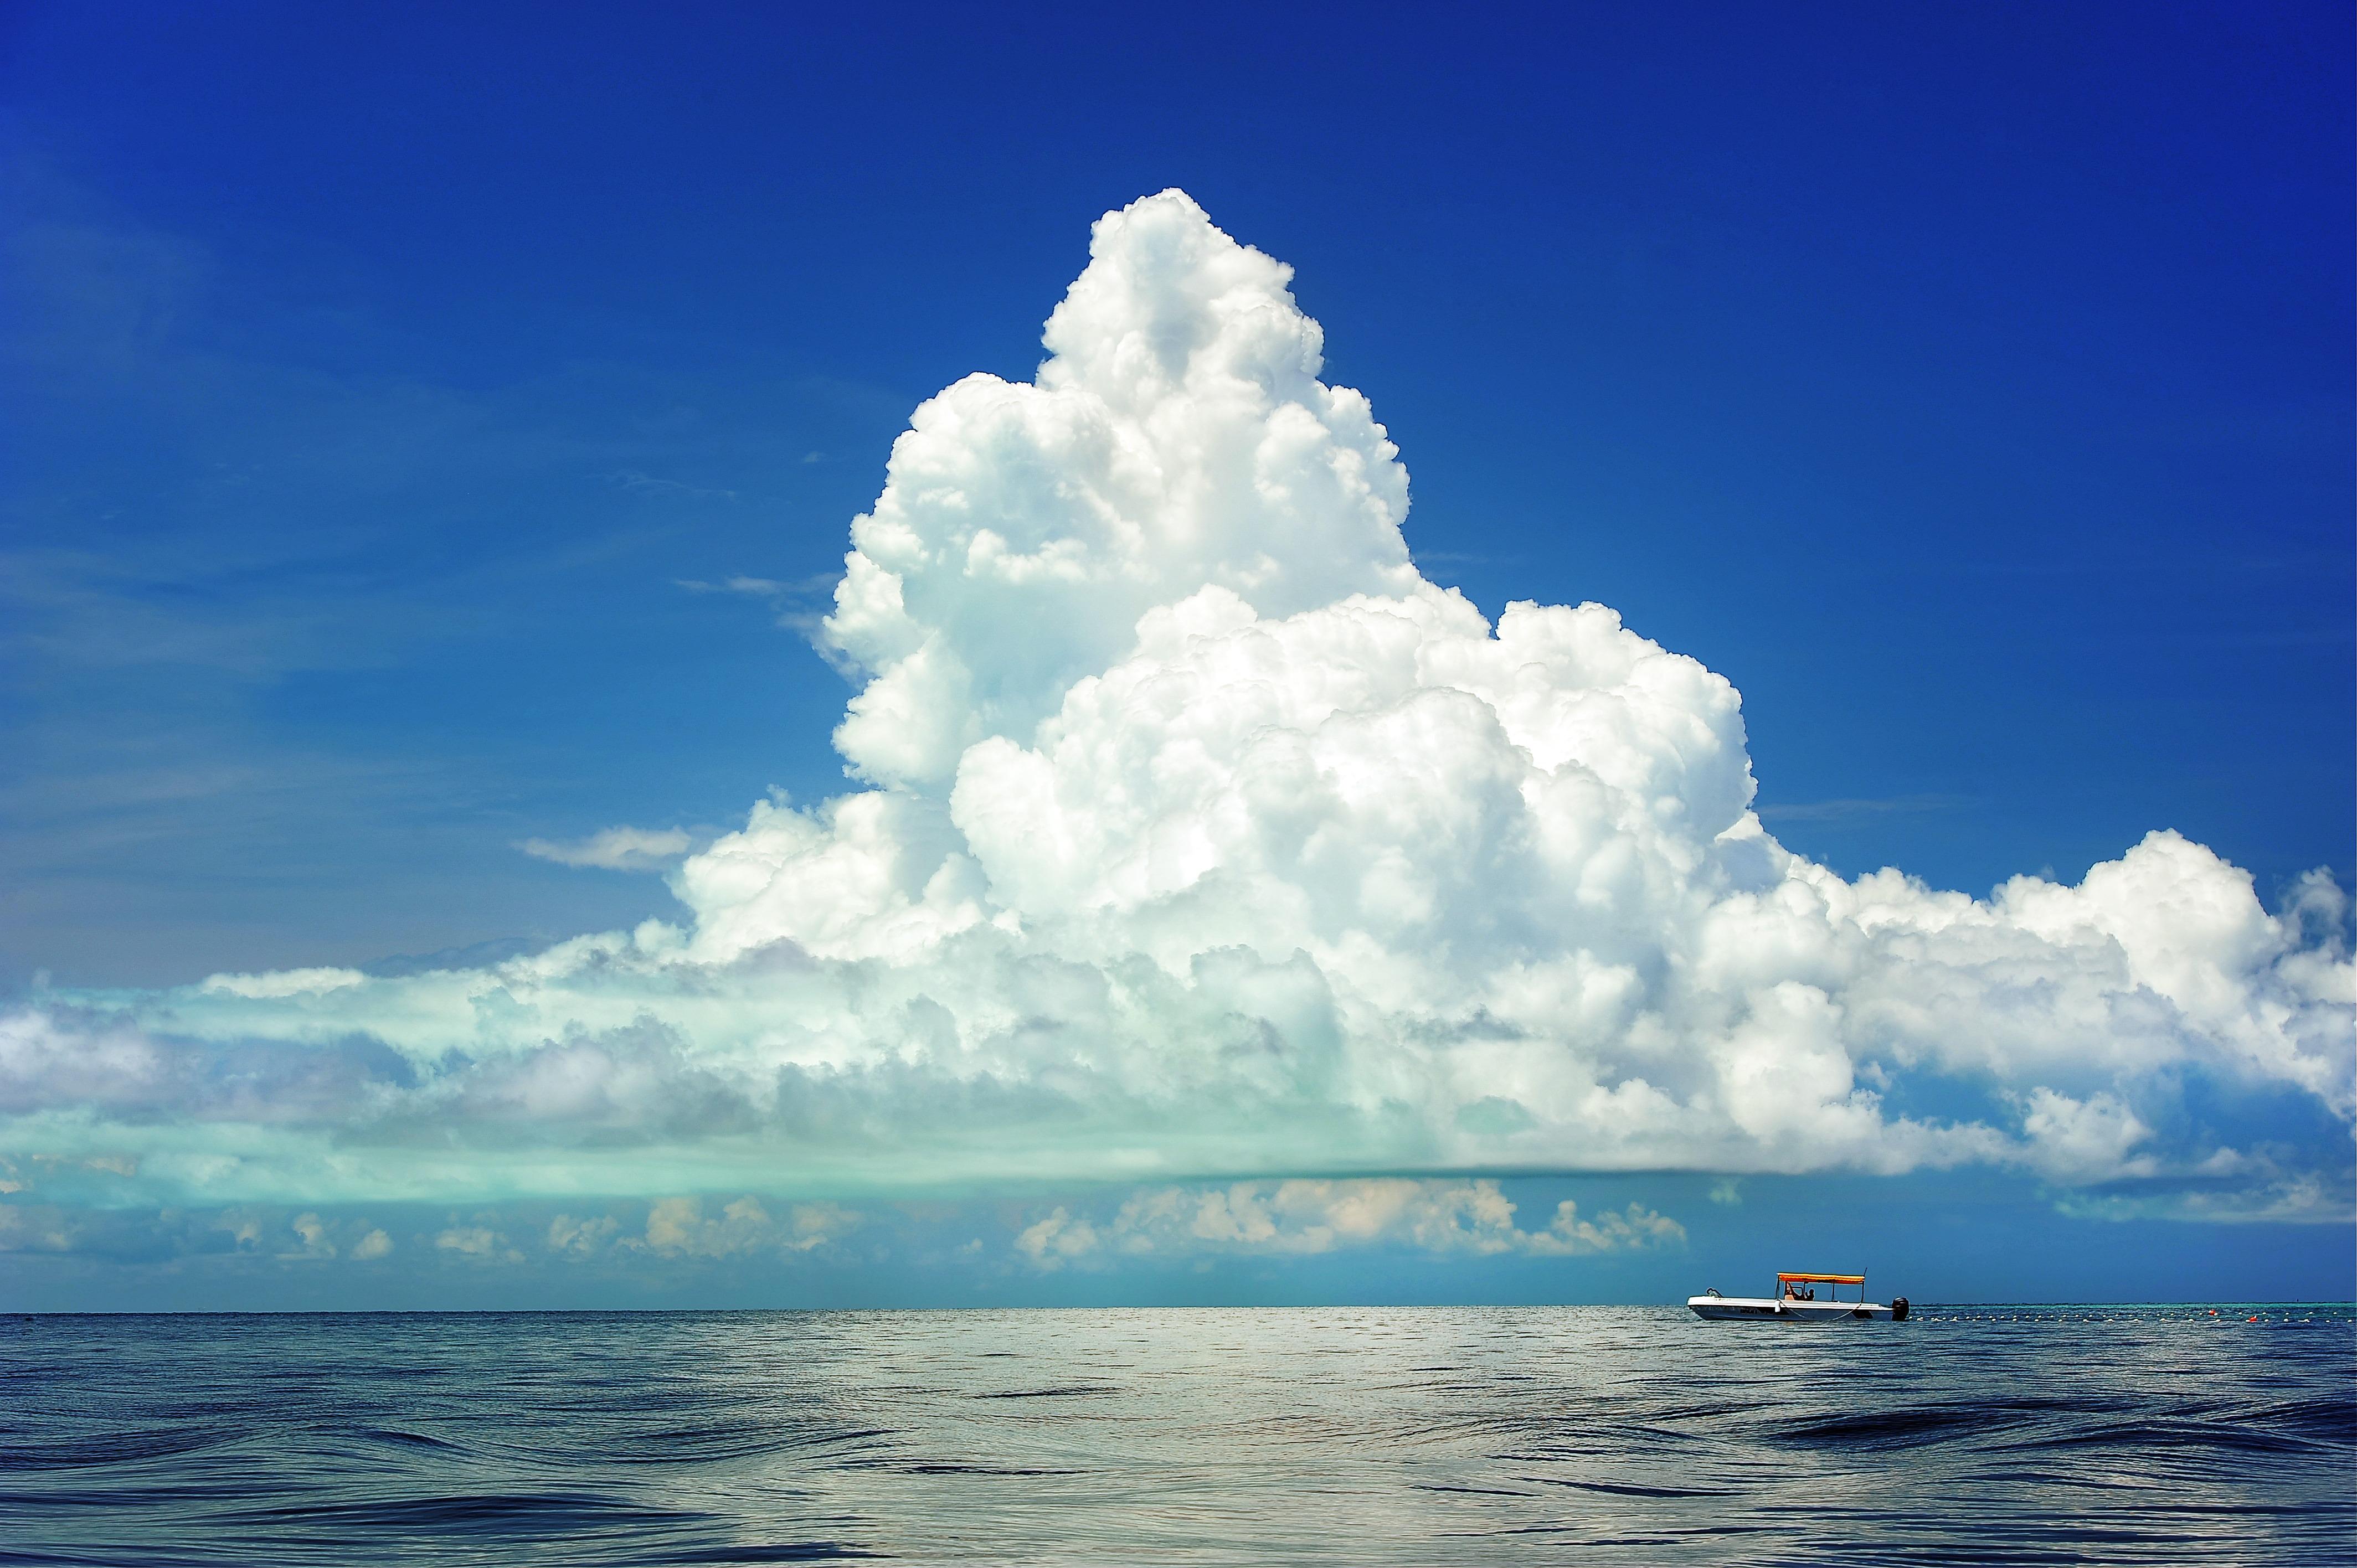 Sailing in the sea photo